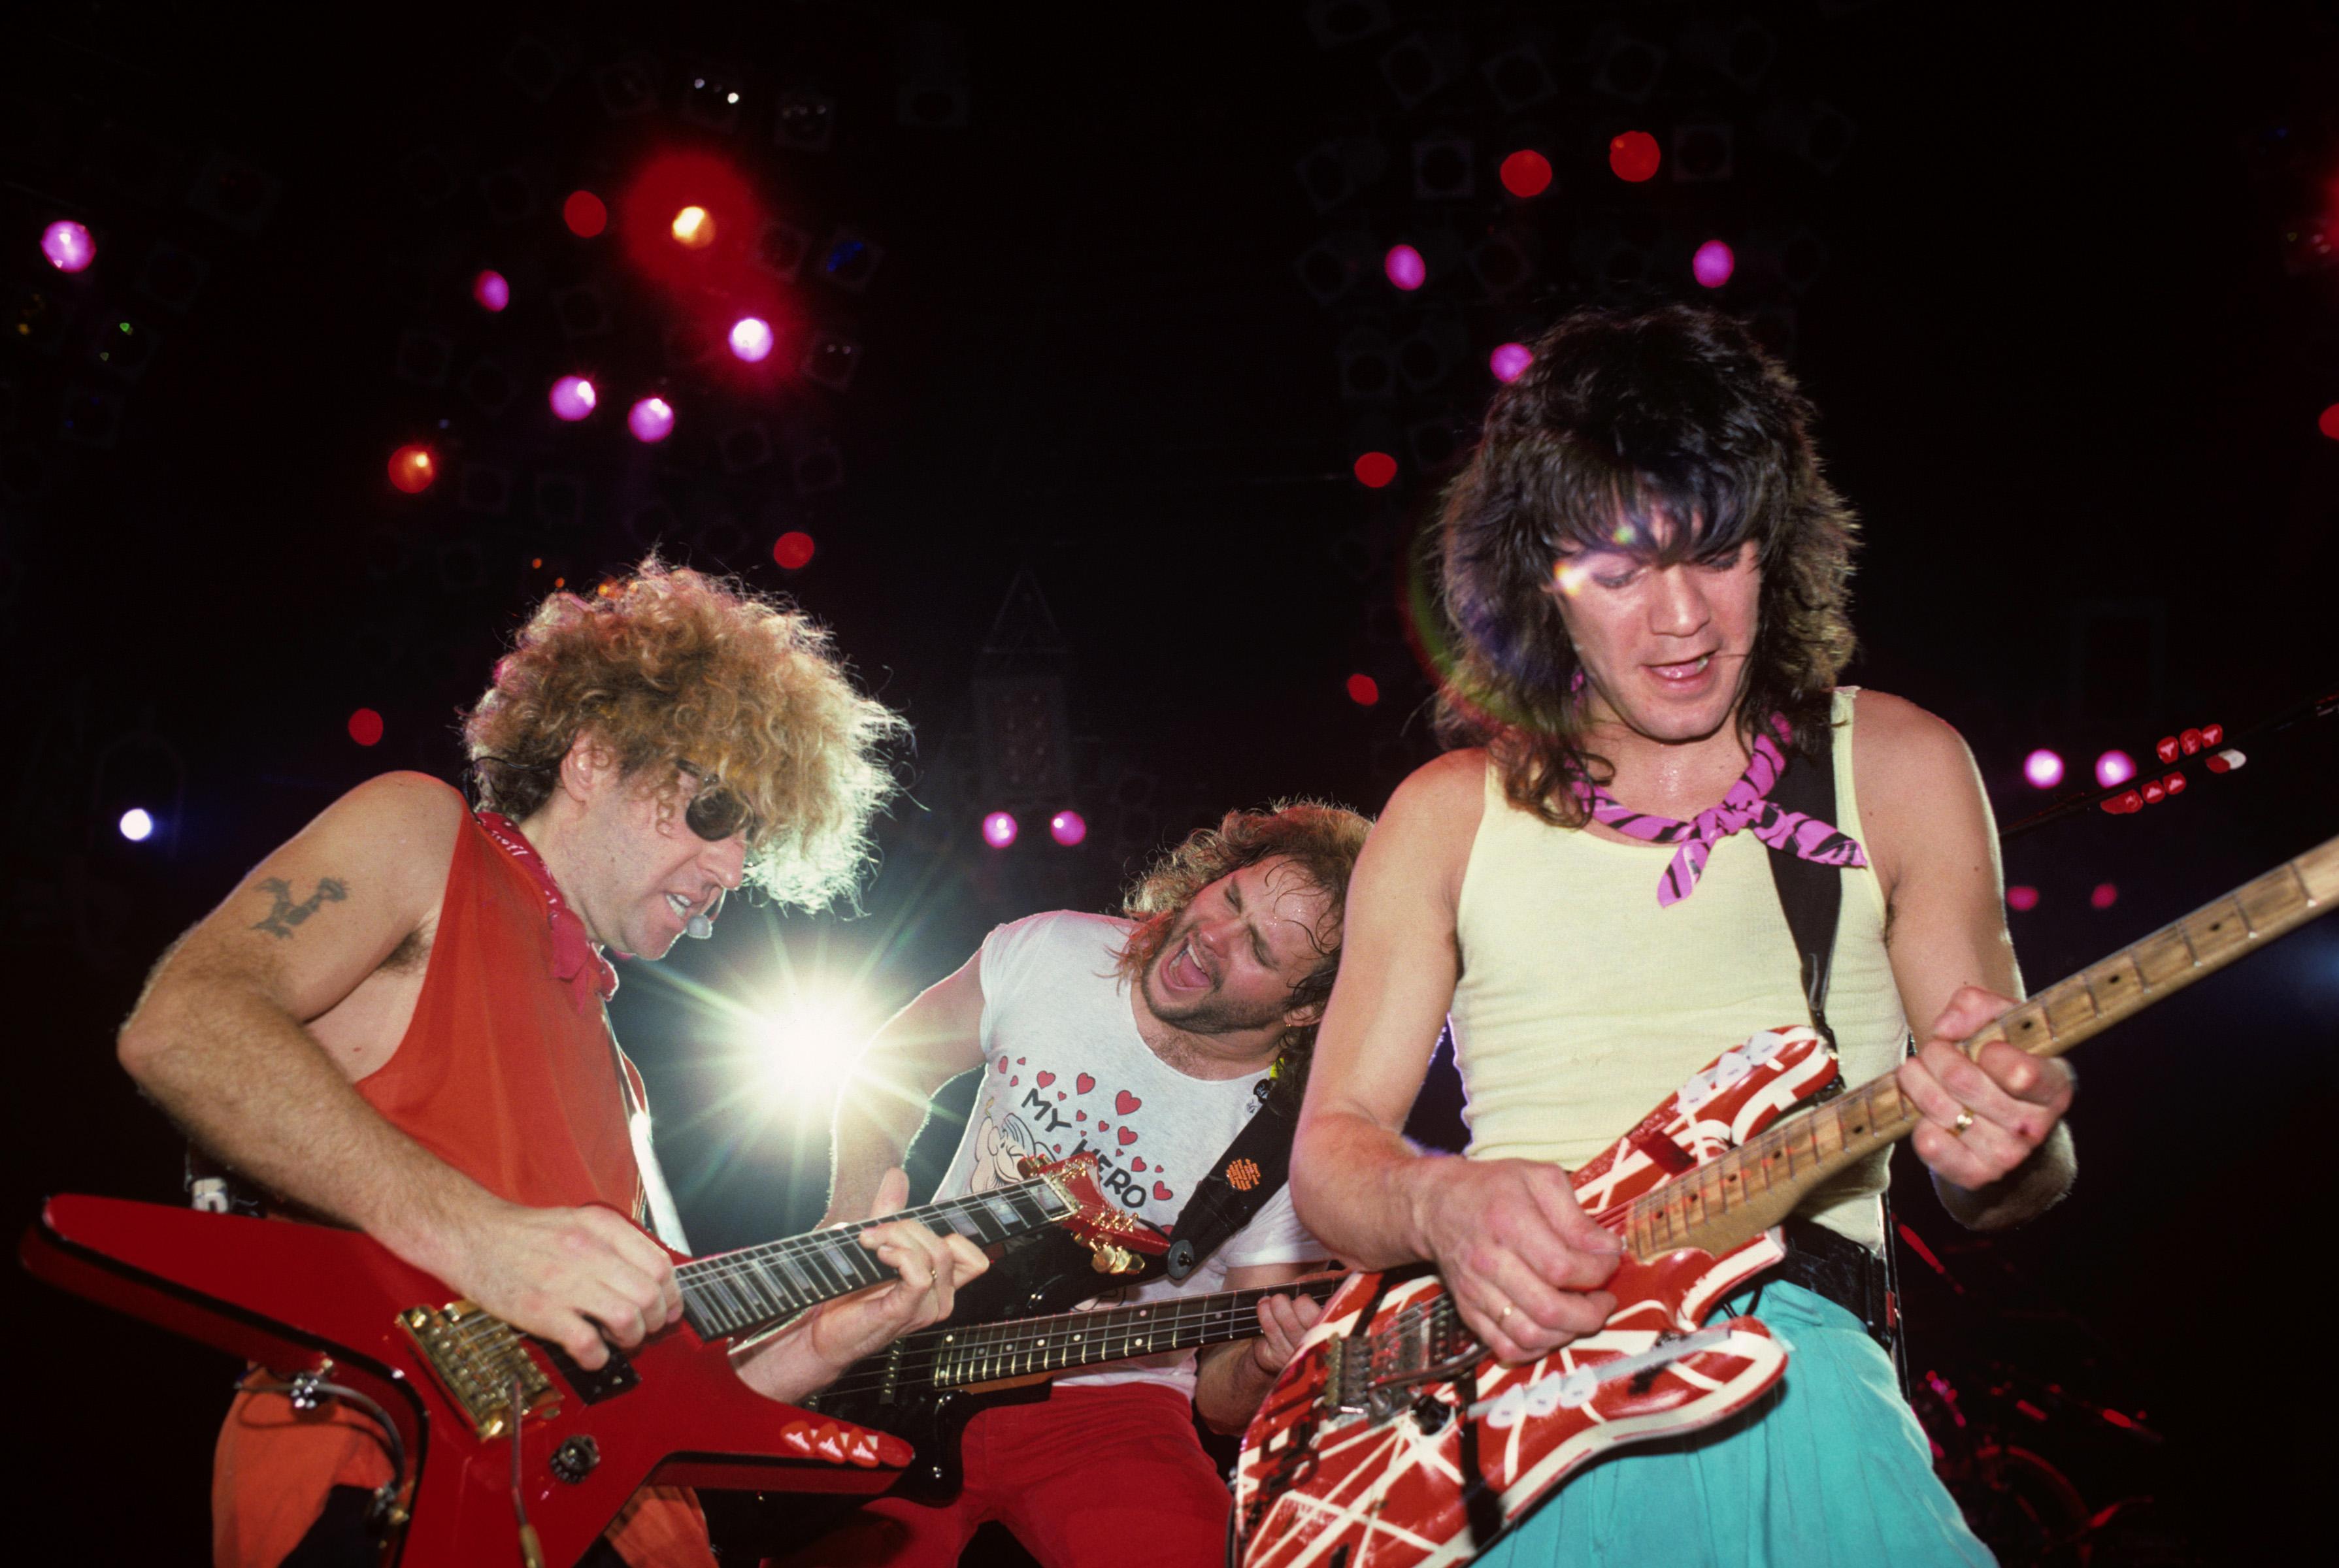 4fea0588 Van Halen, Sammy Hagar, Michael Anthony, Eddie Van Halen, Memphis Colliseum